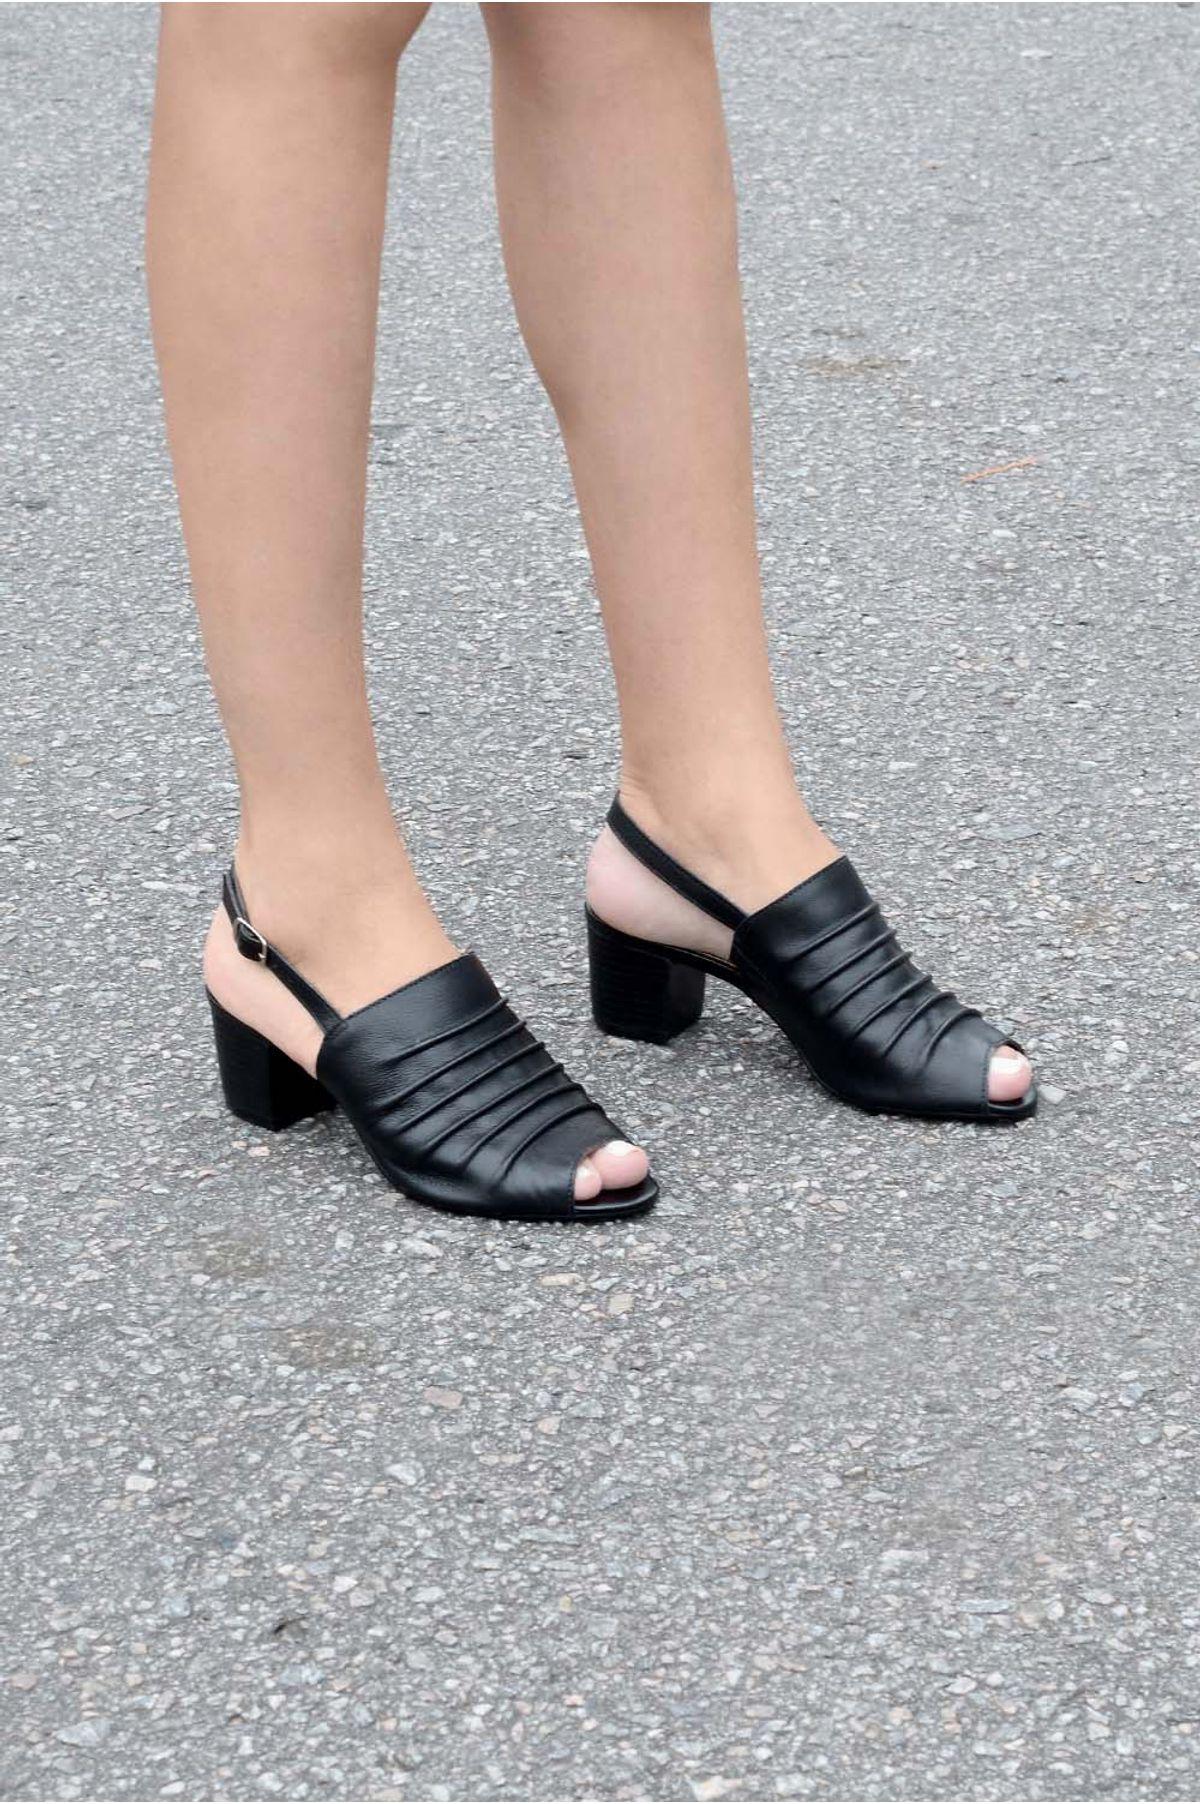 51acb8b9c Sandália Feminina Salto Médio Misye Mundial CR-PRETO - Mundial Calçados